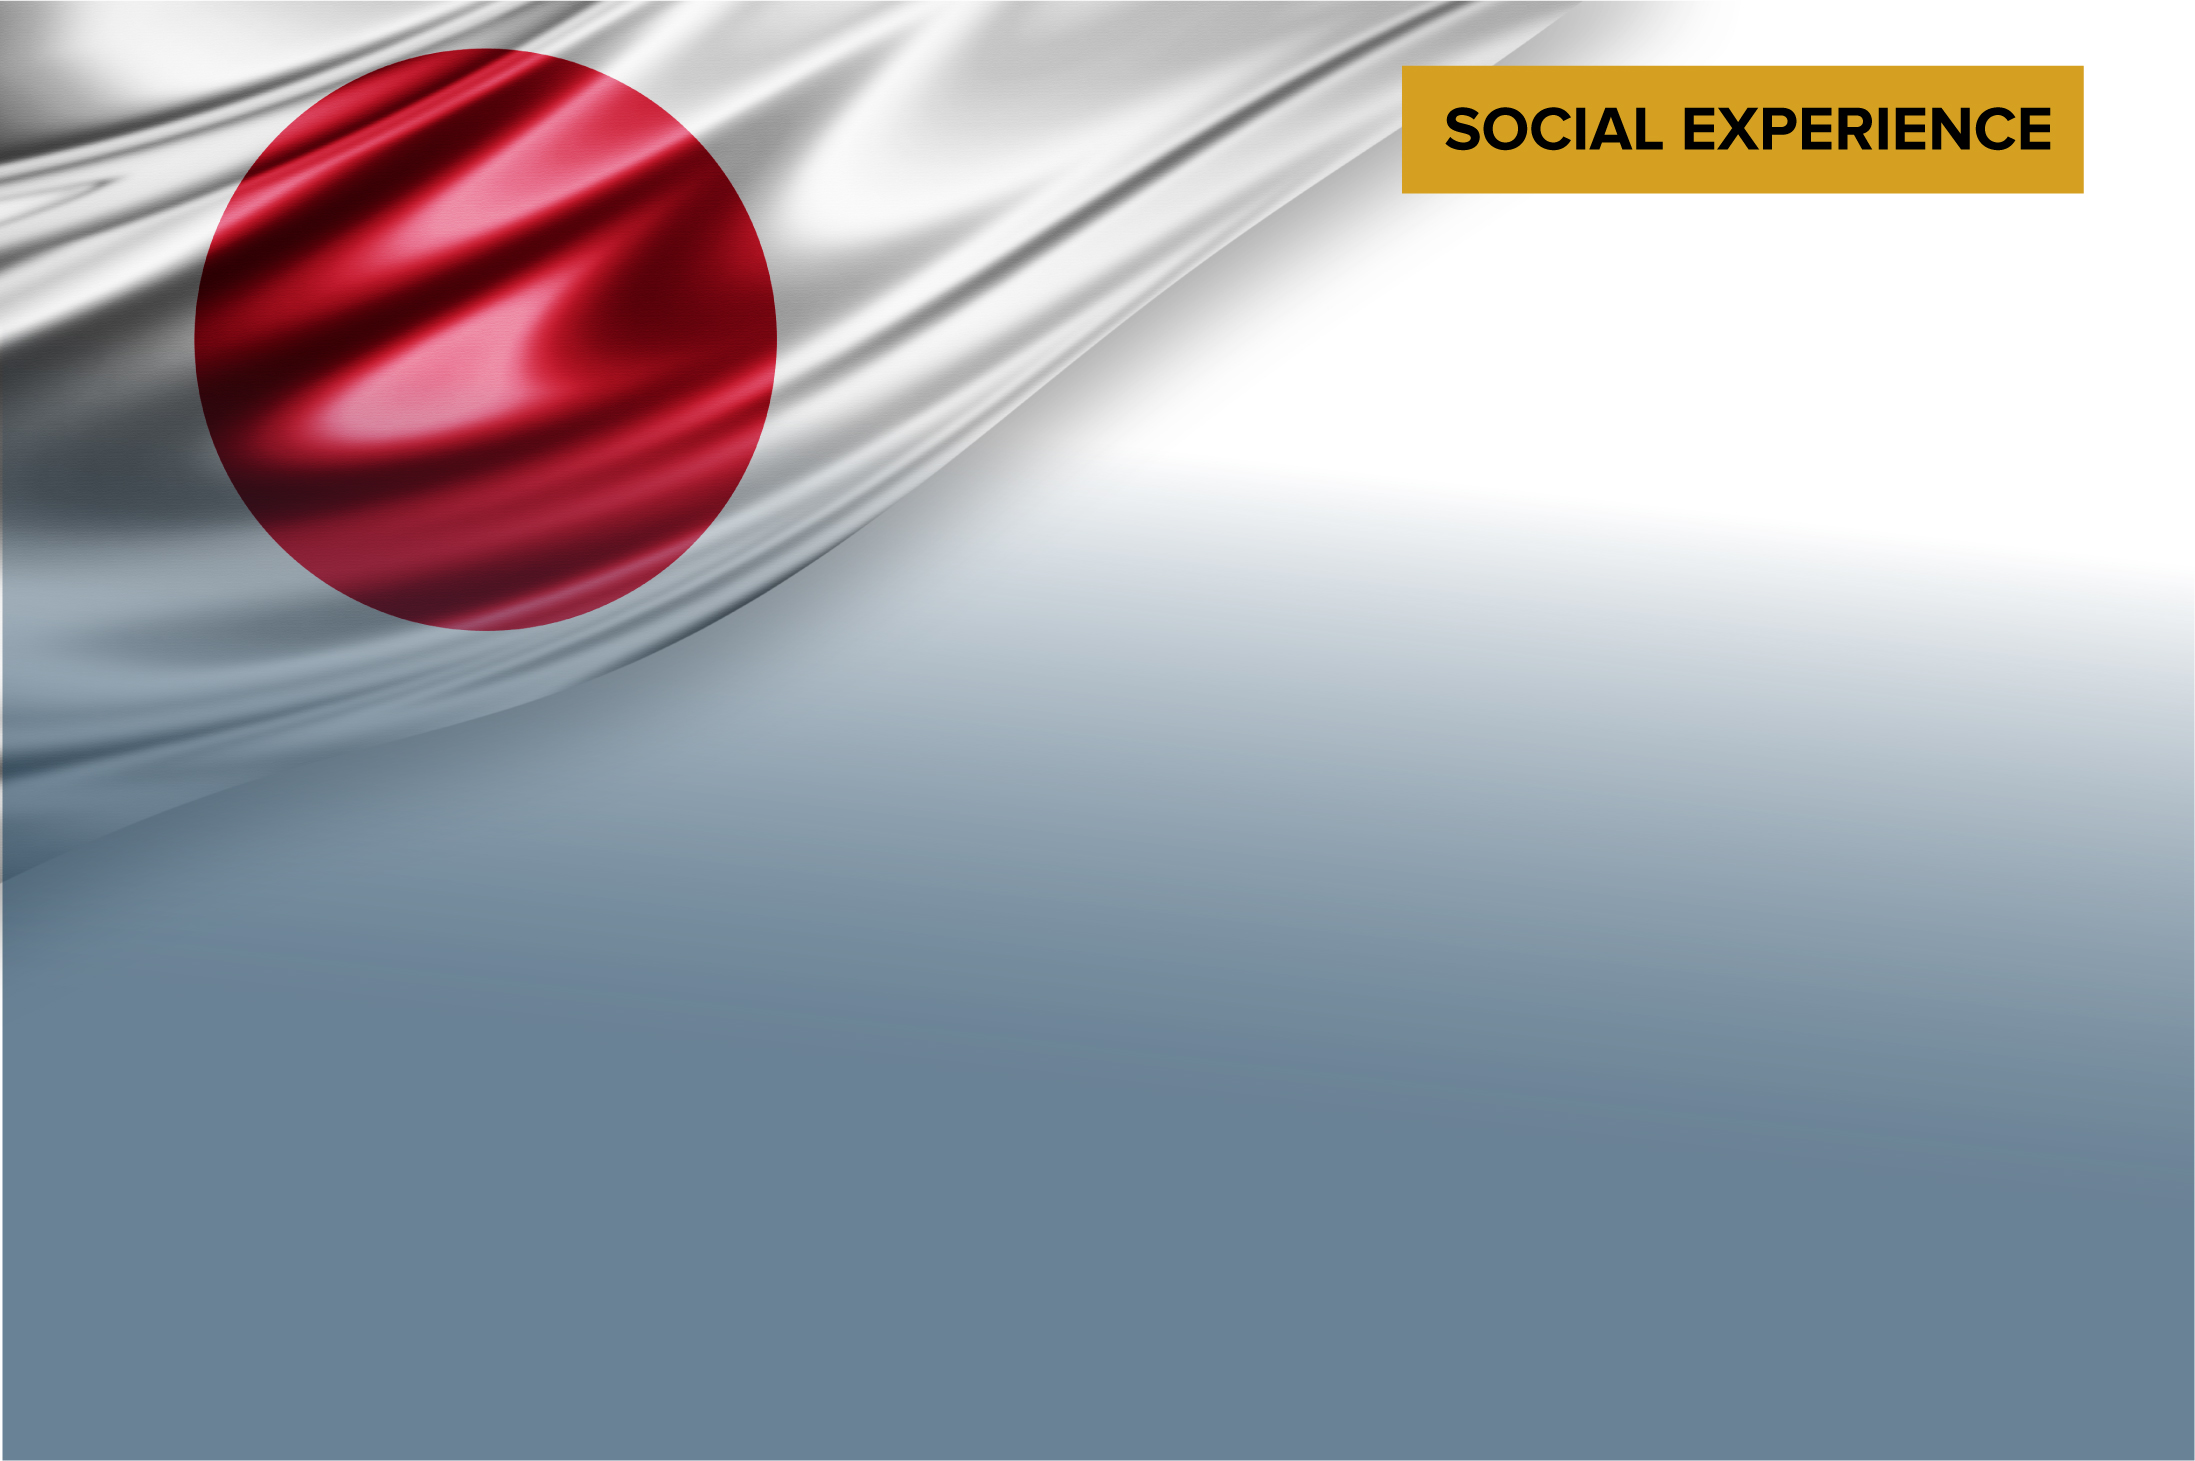 Friday Brunch - Taste Of Japan